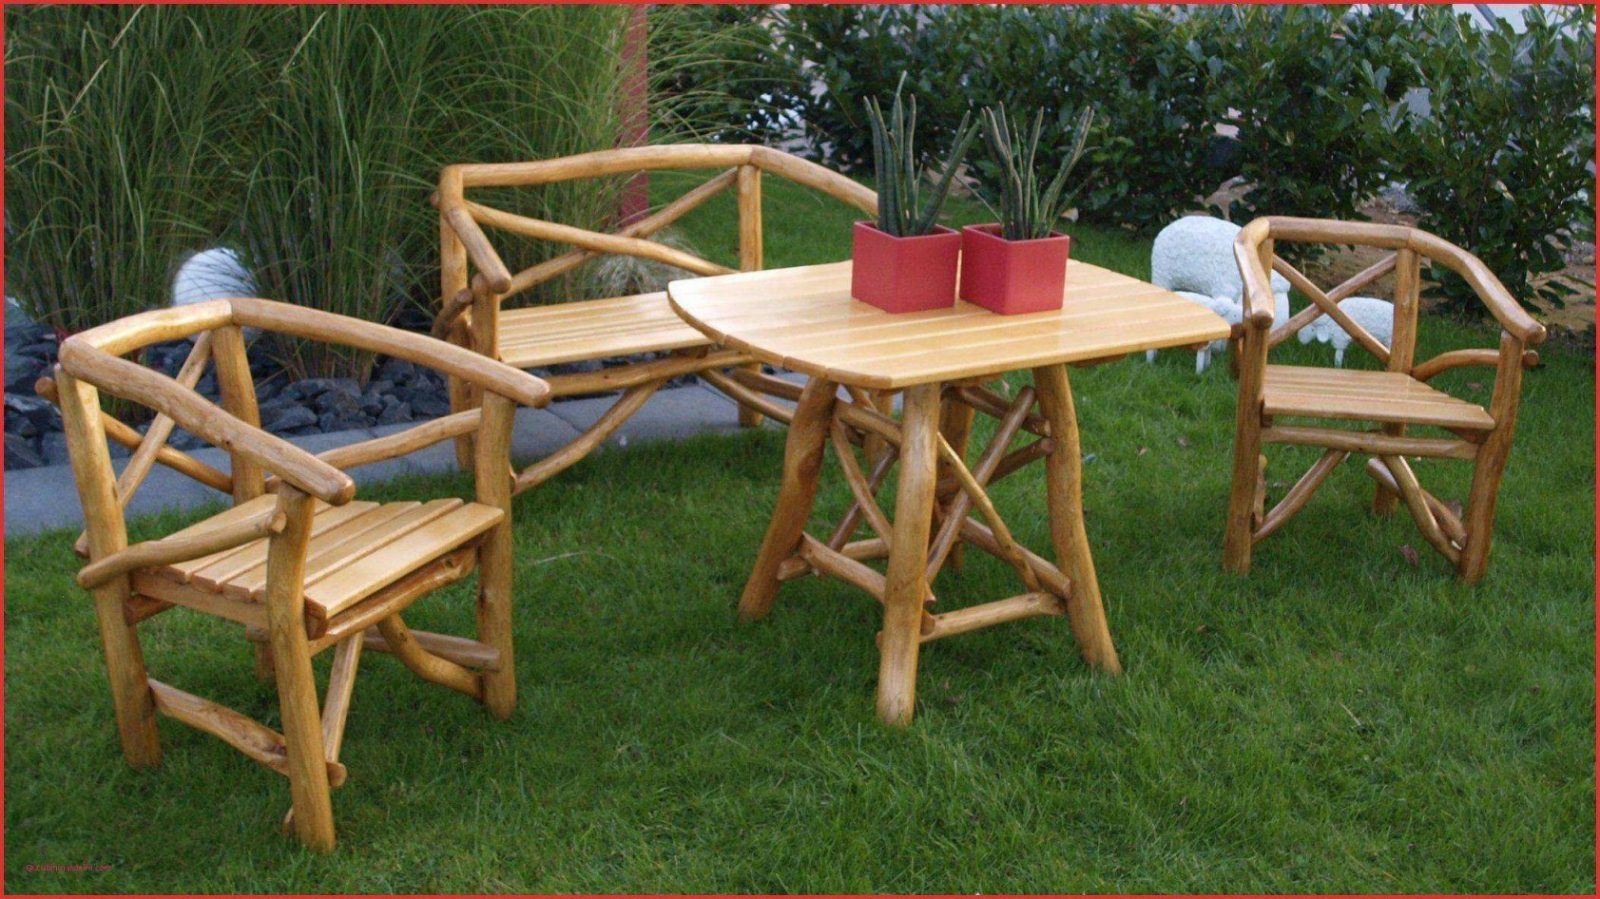 75 Rustikale Holz Gartenmöbel Aus Polen  Evercreative von Rustikale Holz Gartenmöbel Aus Polen Bild